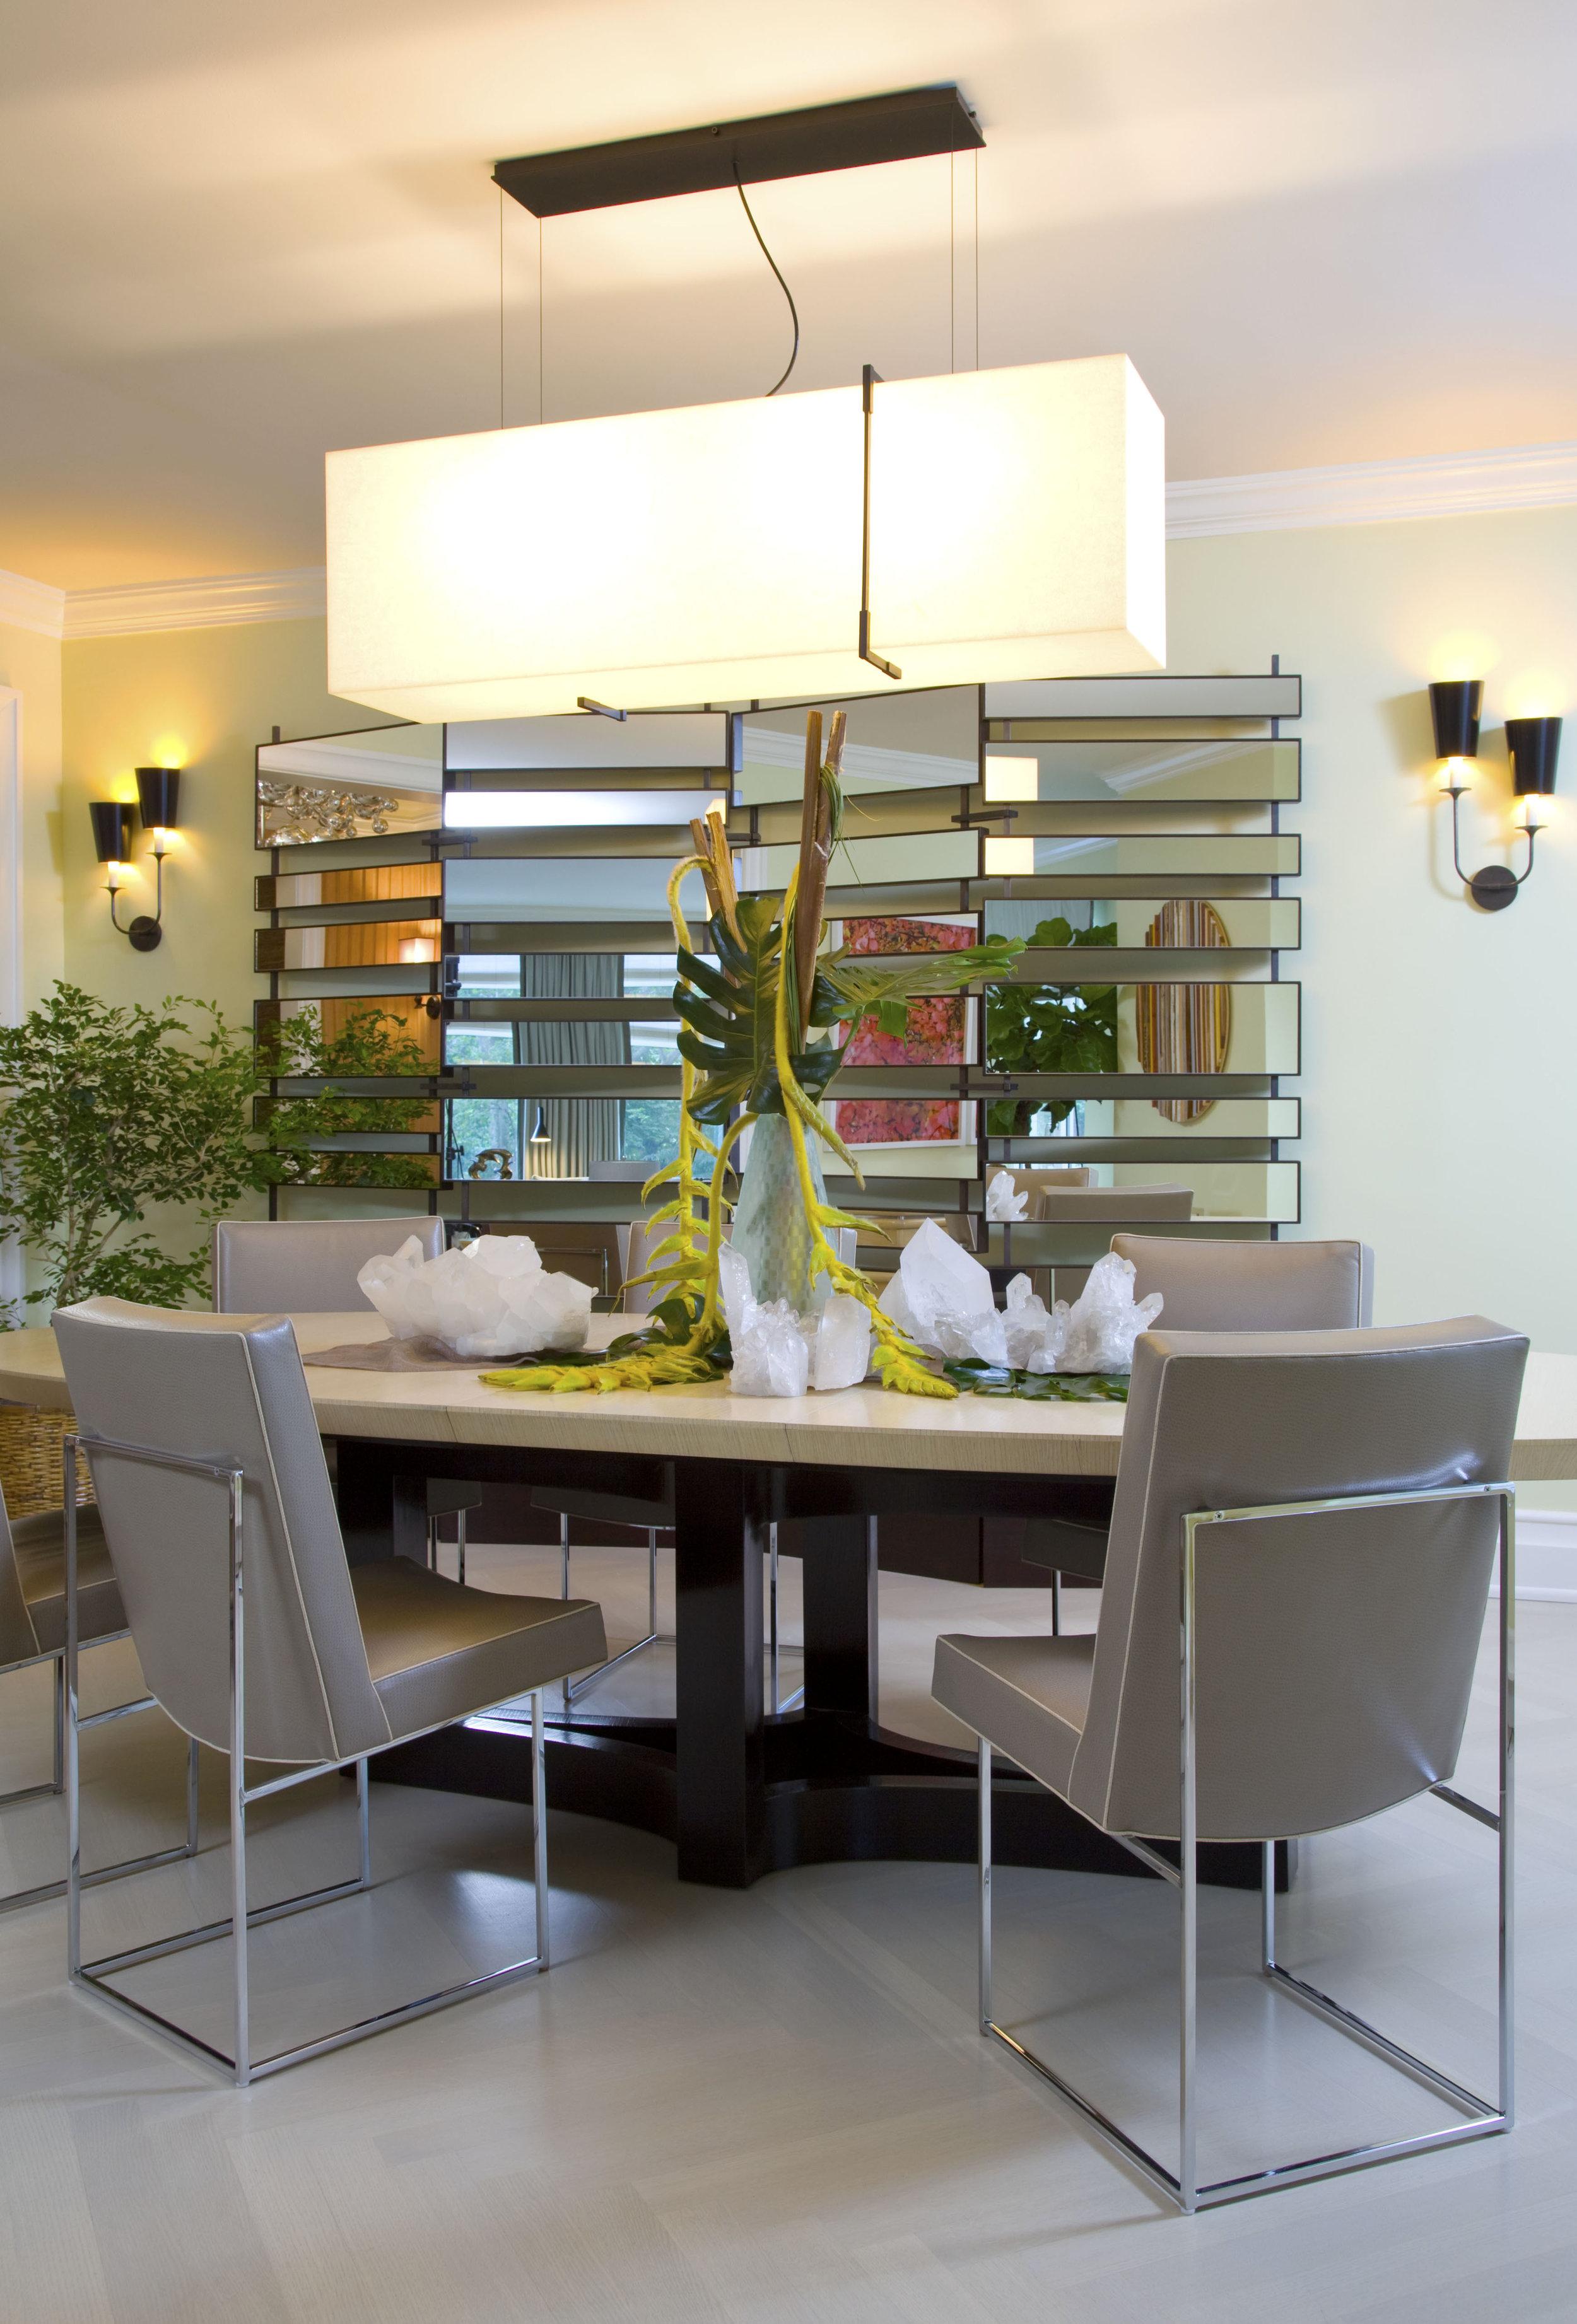 8 - CPW-10 Dining Room.jpg